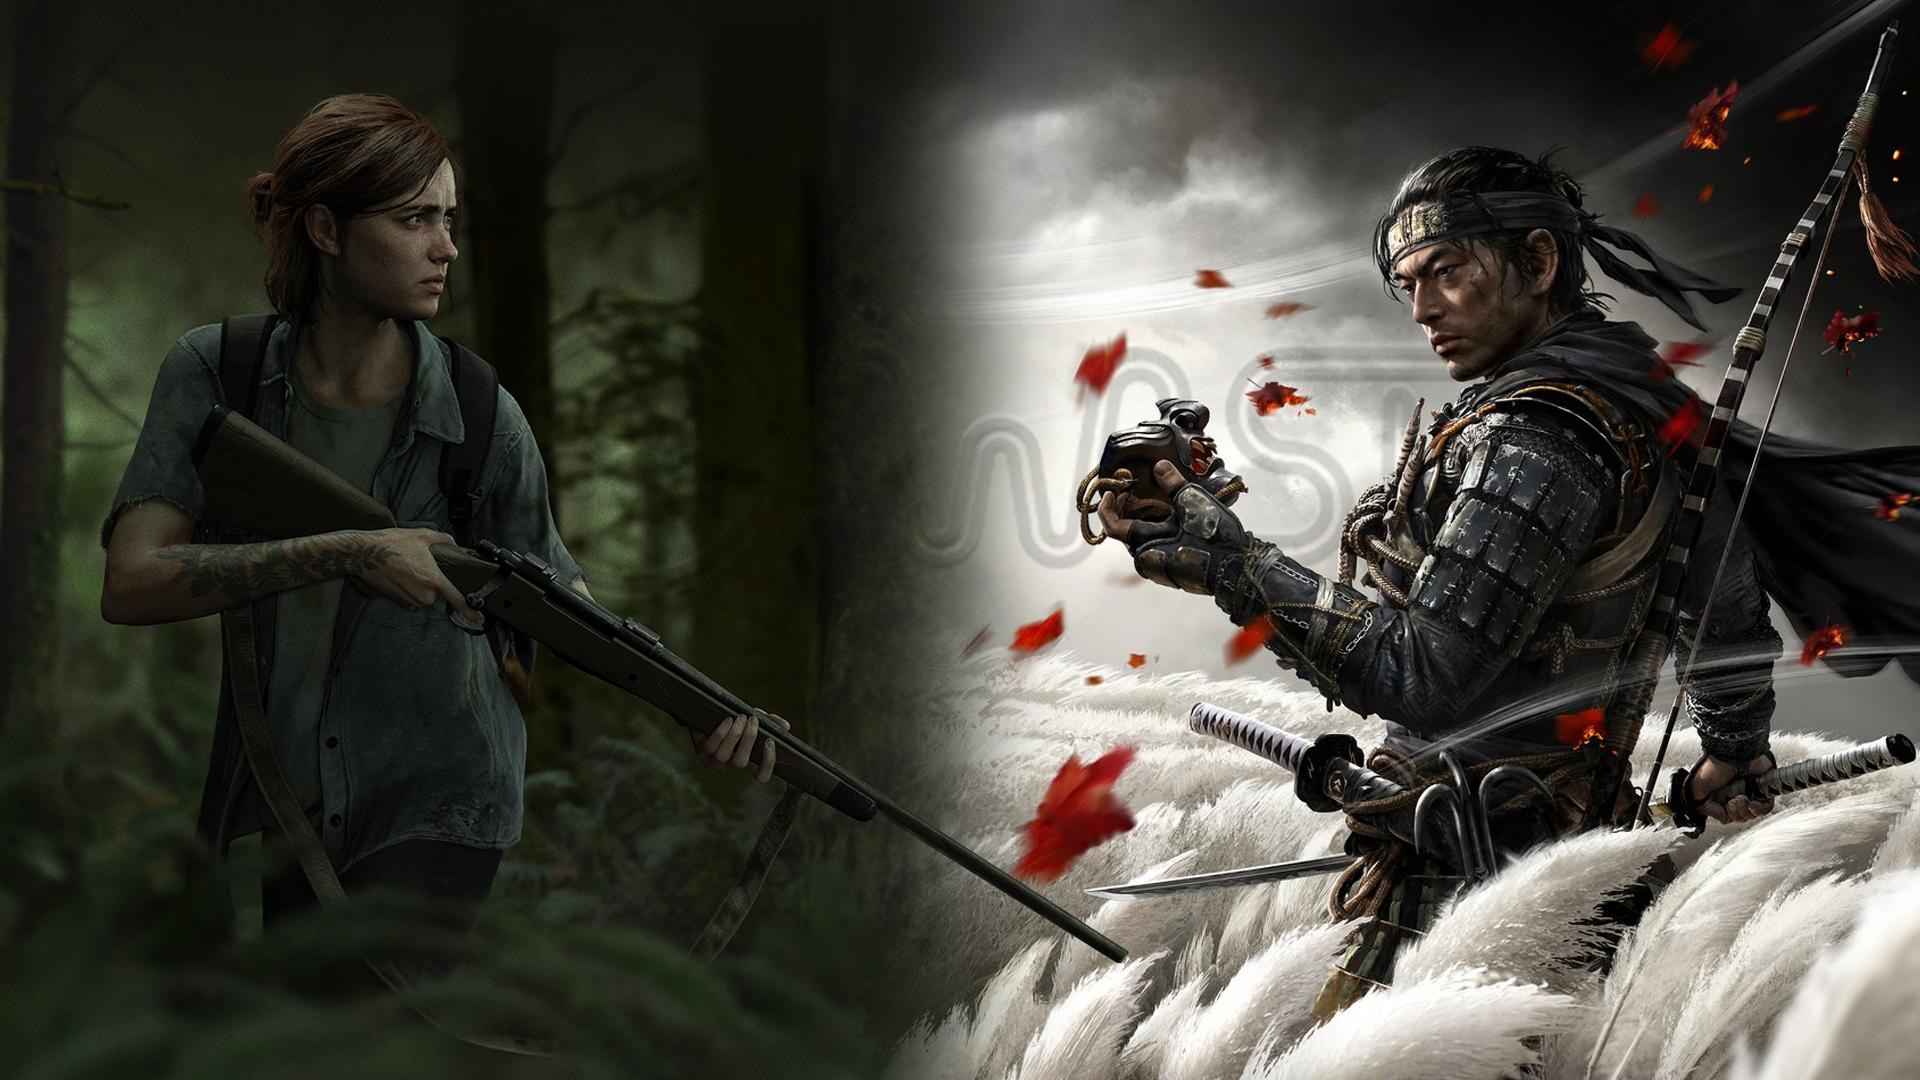 Novas datas para Ghost of Tsushima e The Last of Us Part II